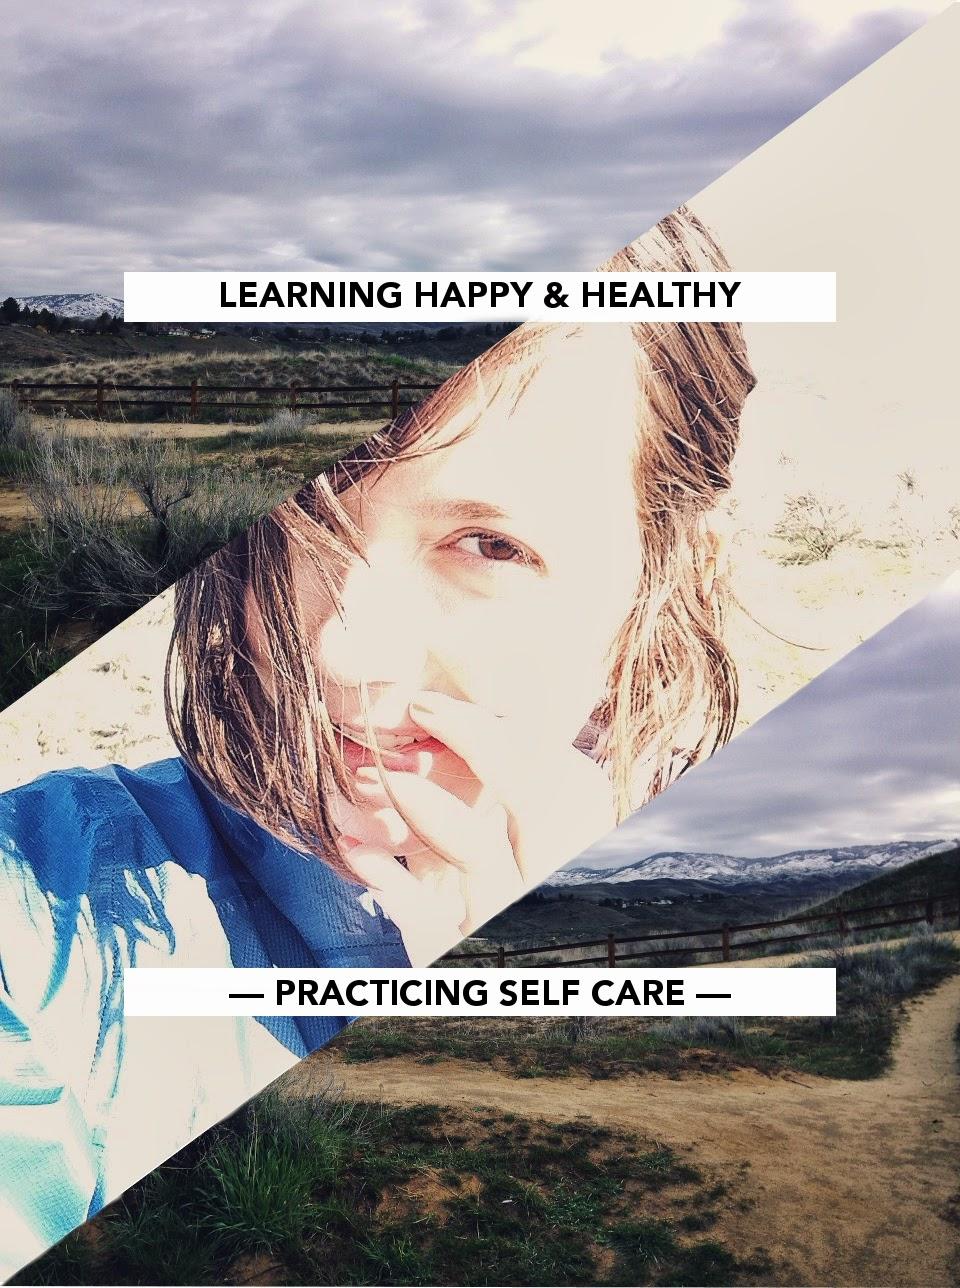 PRACTICING+SELF+CARE.JPG